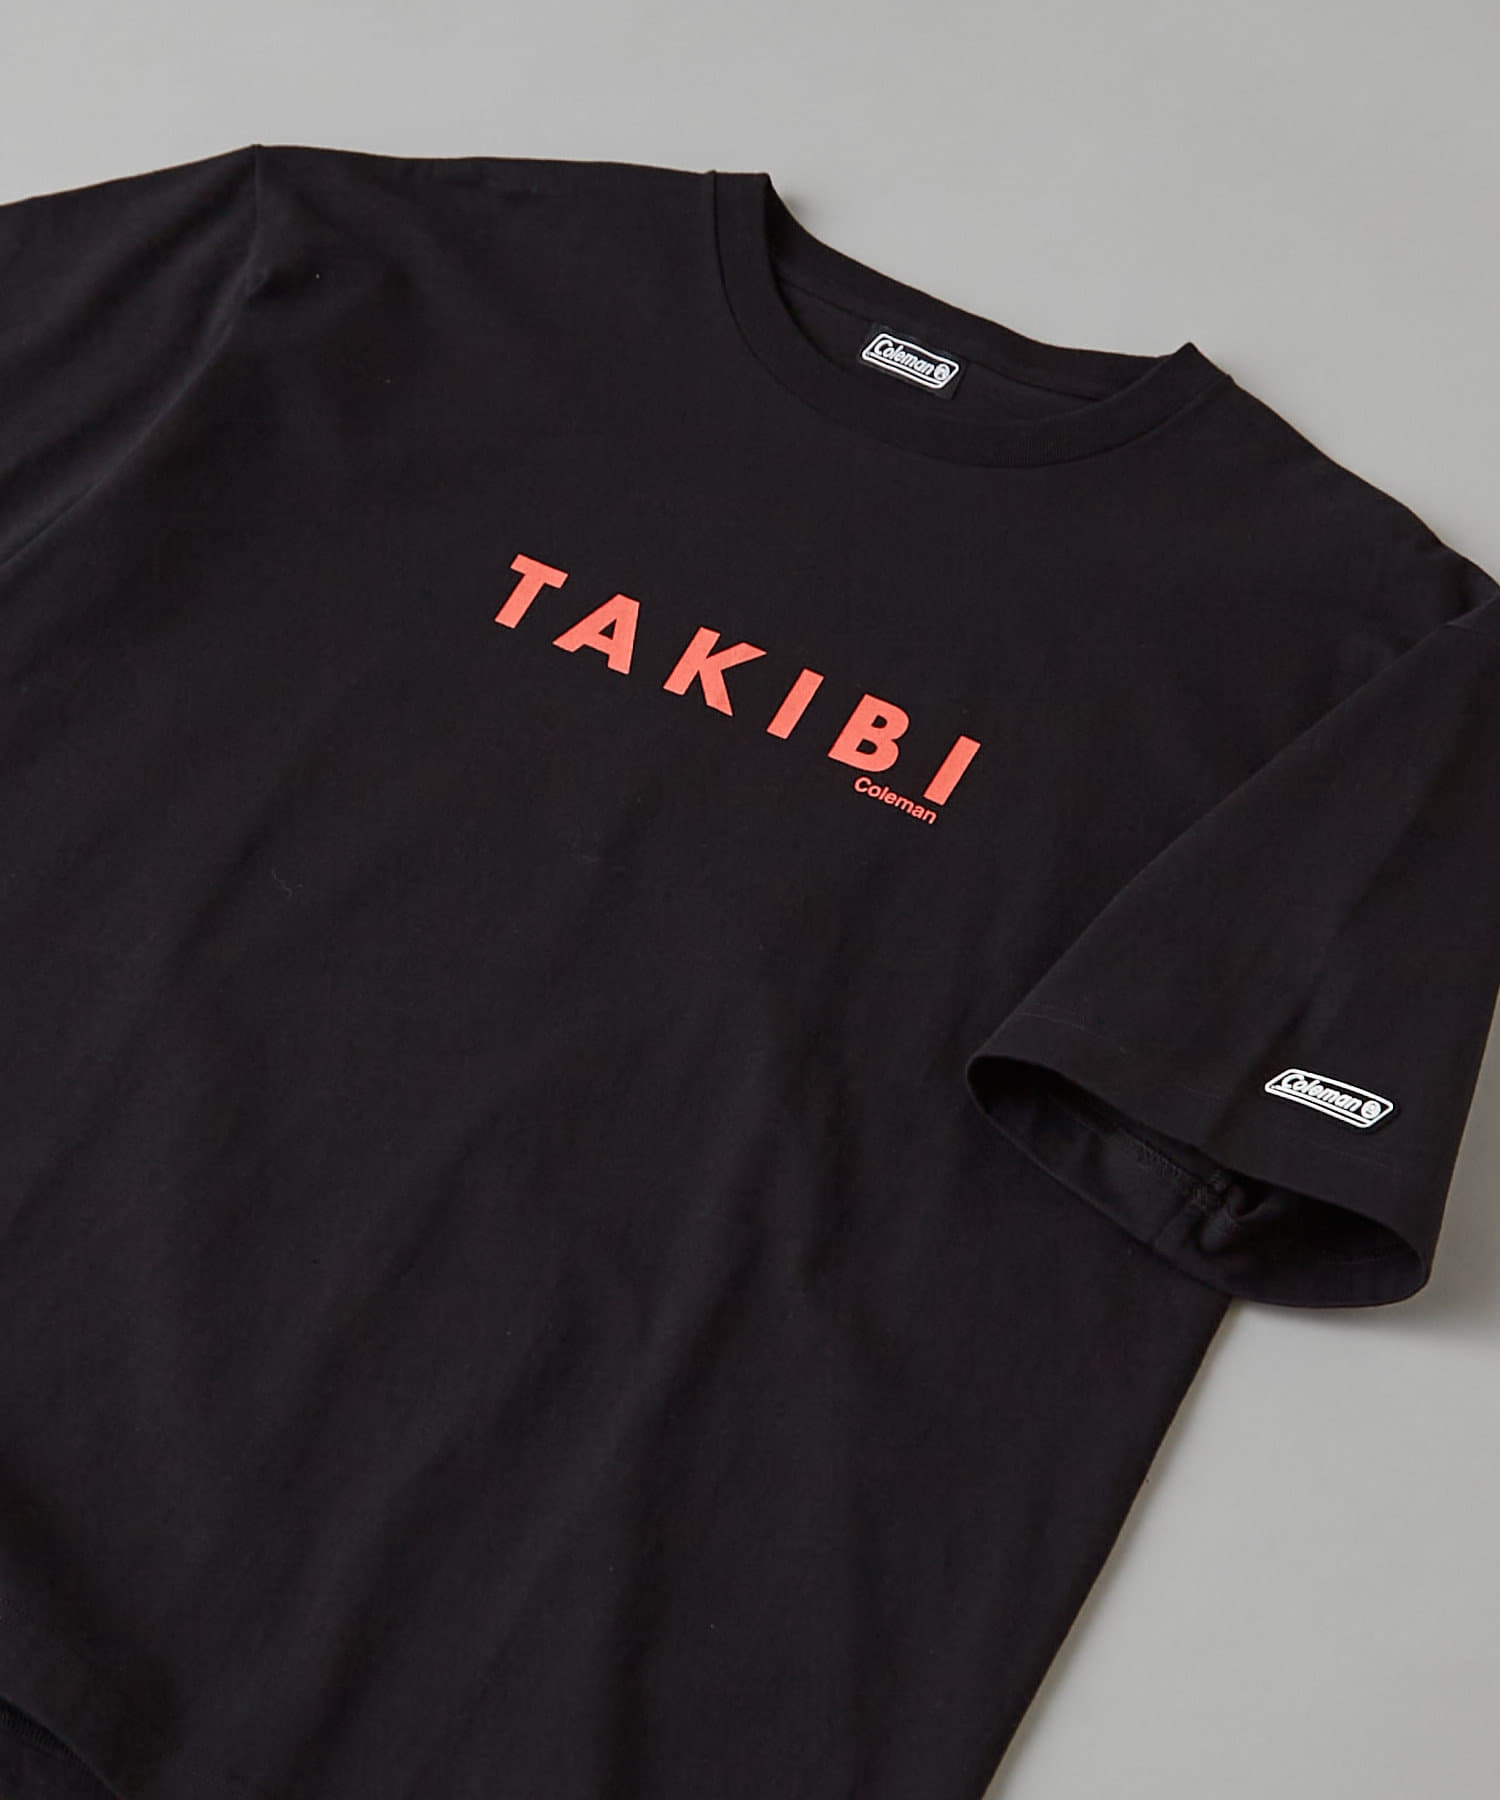 CIAOPANIC(チャオパニック) 【Coleman×CIAOPANIC】TAKIBI バックプリントロゴTシャツ